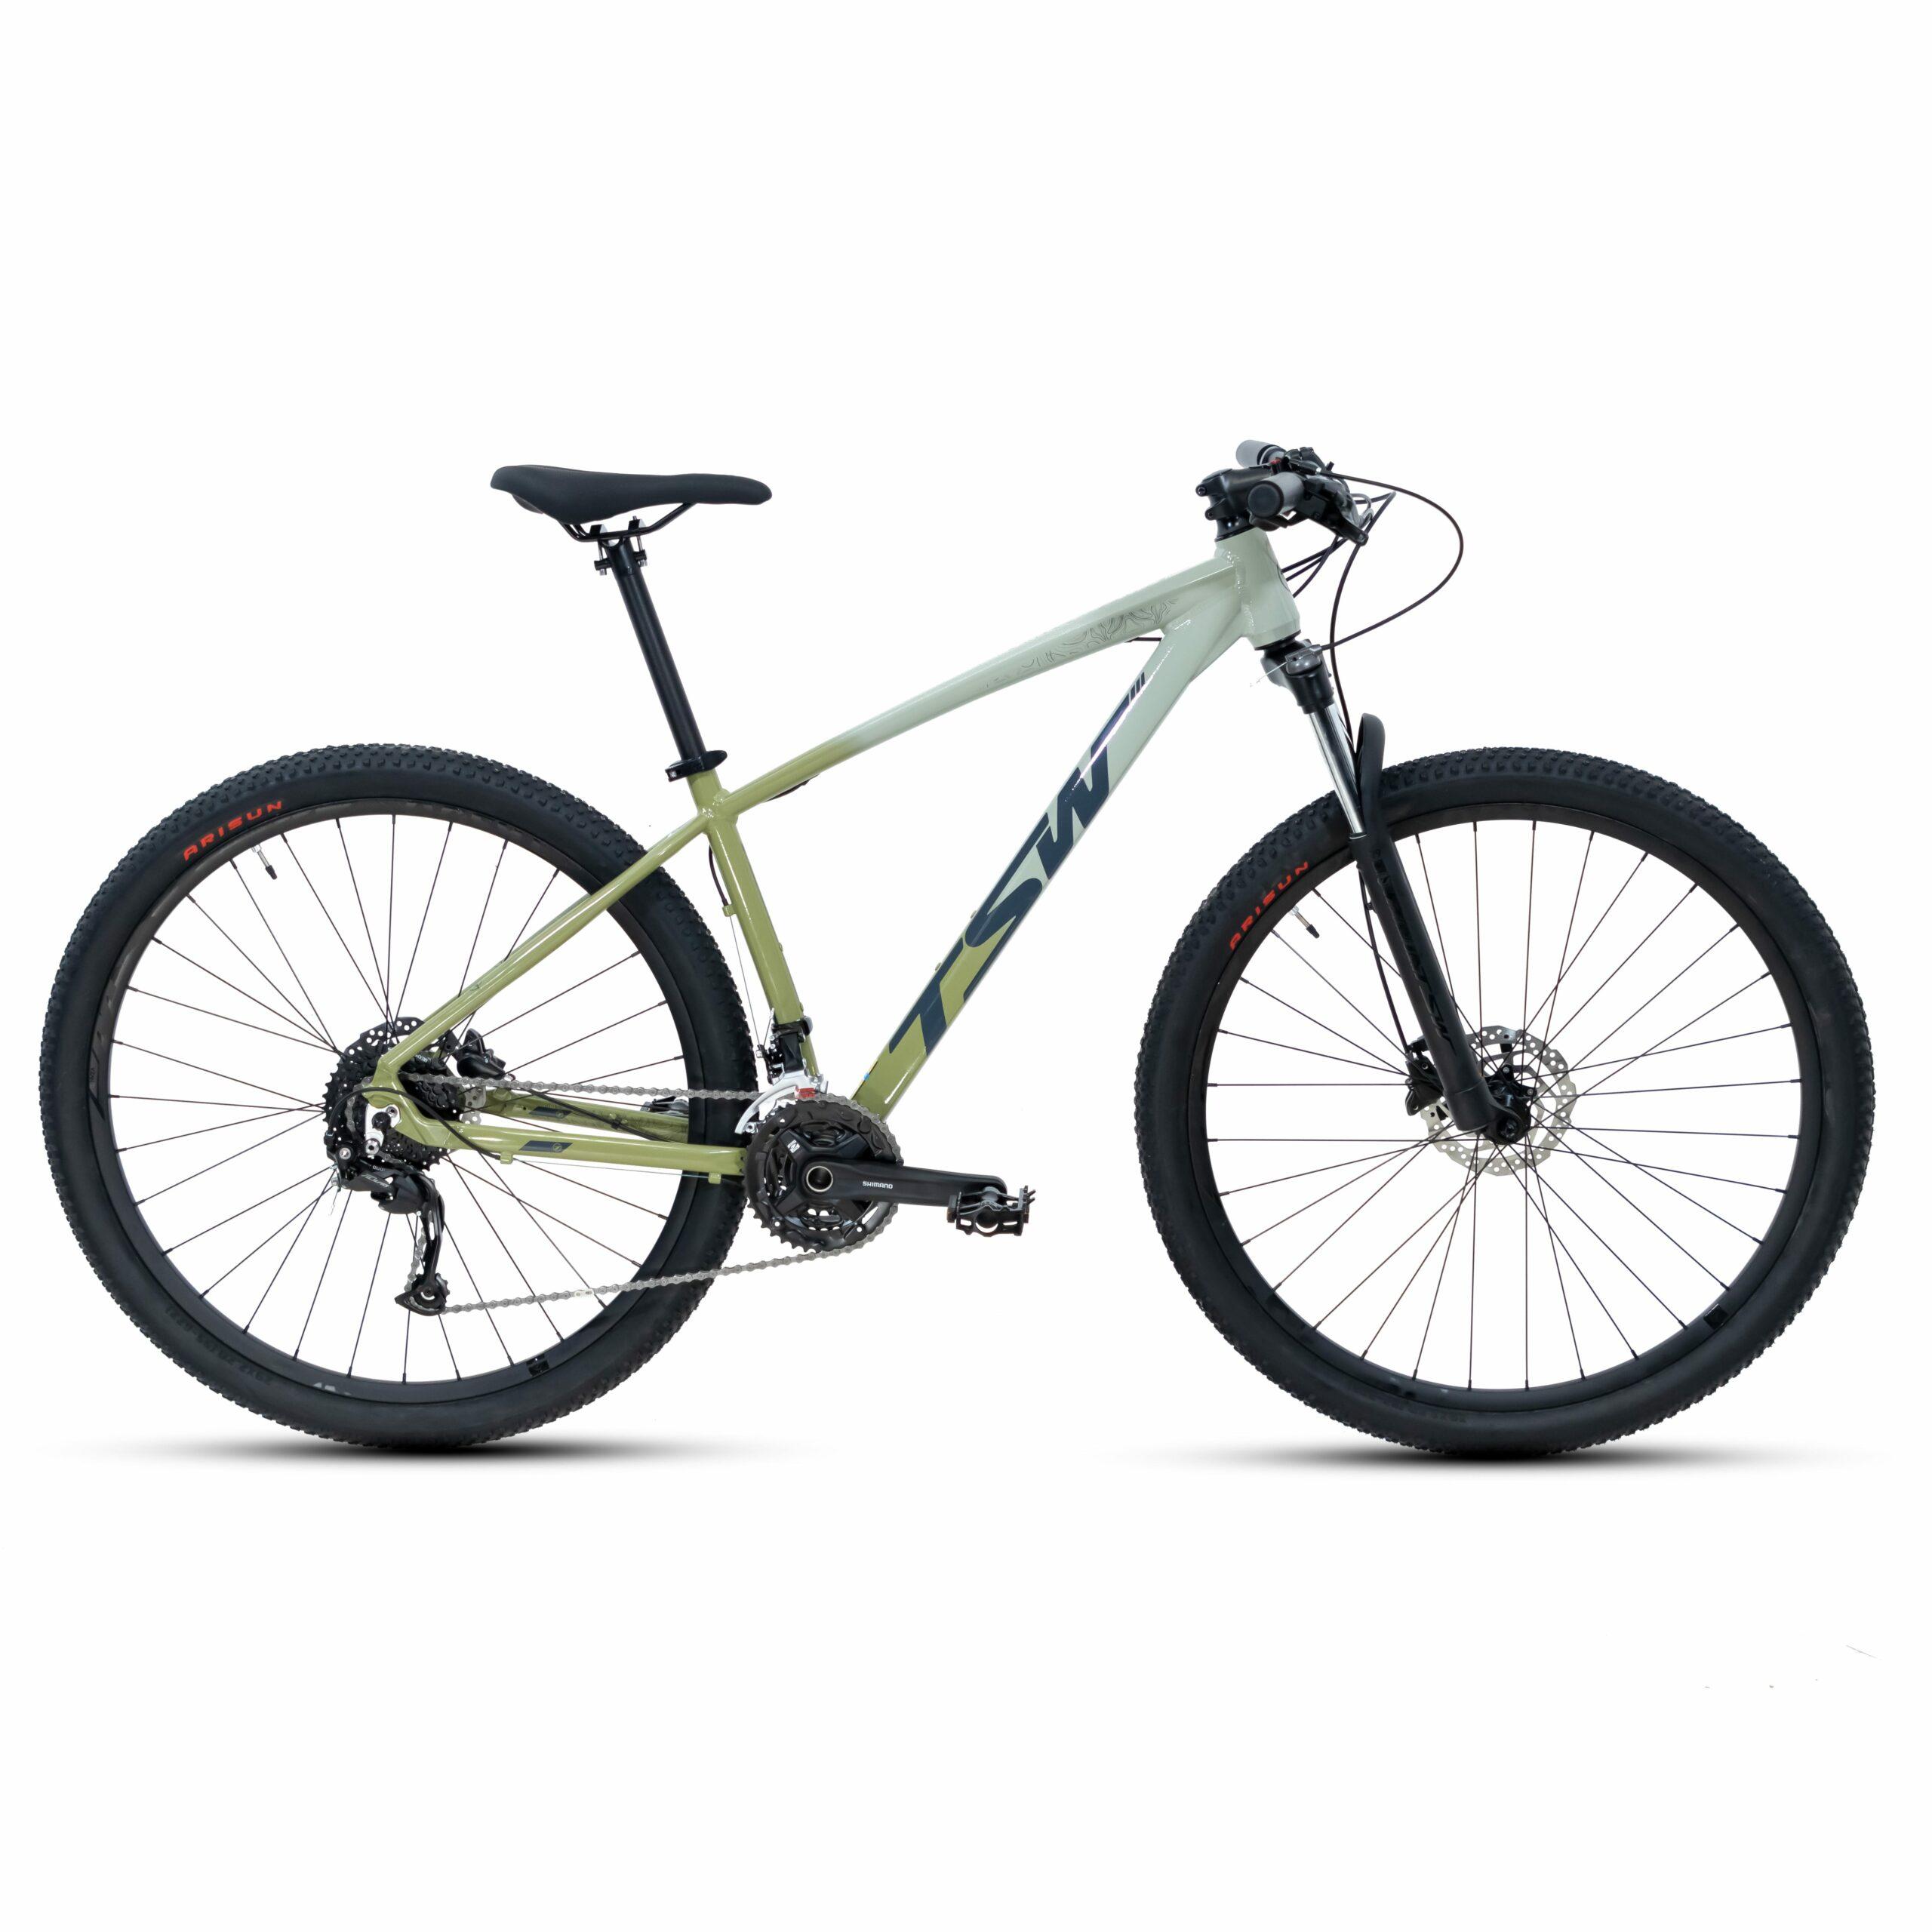 Bicicleta TSW Hunch Plus | 2021/2022 3